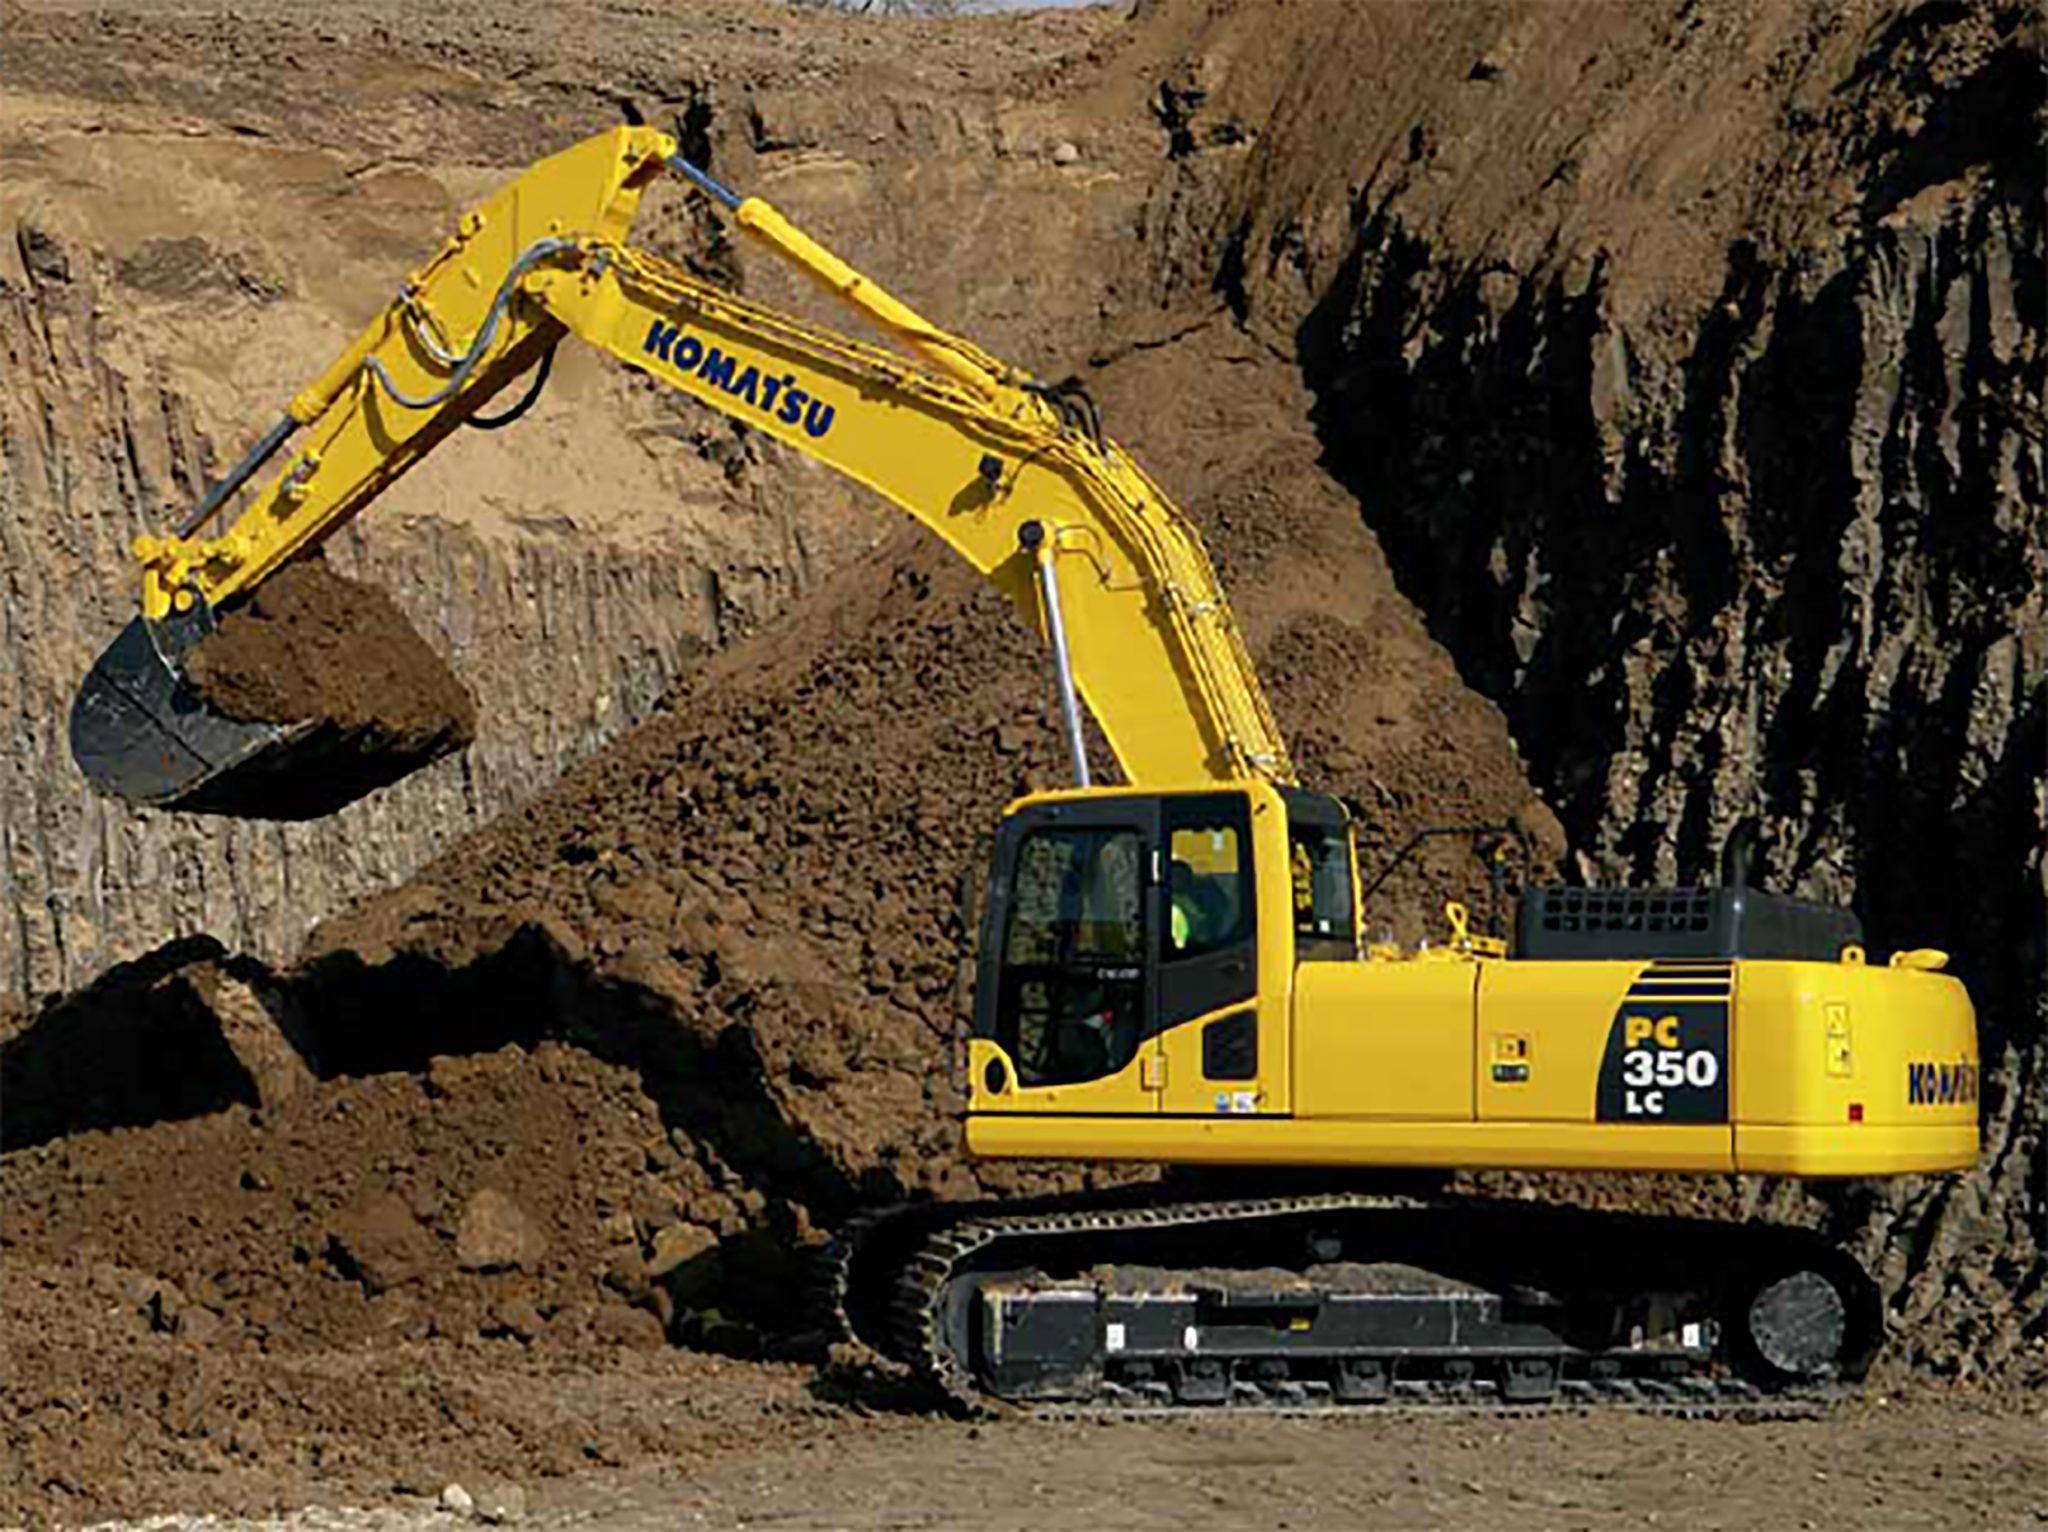 Komatsu PC350 Excavator | Ridgway Rentals Nationwide Plant Hire